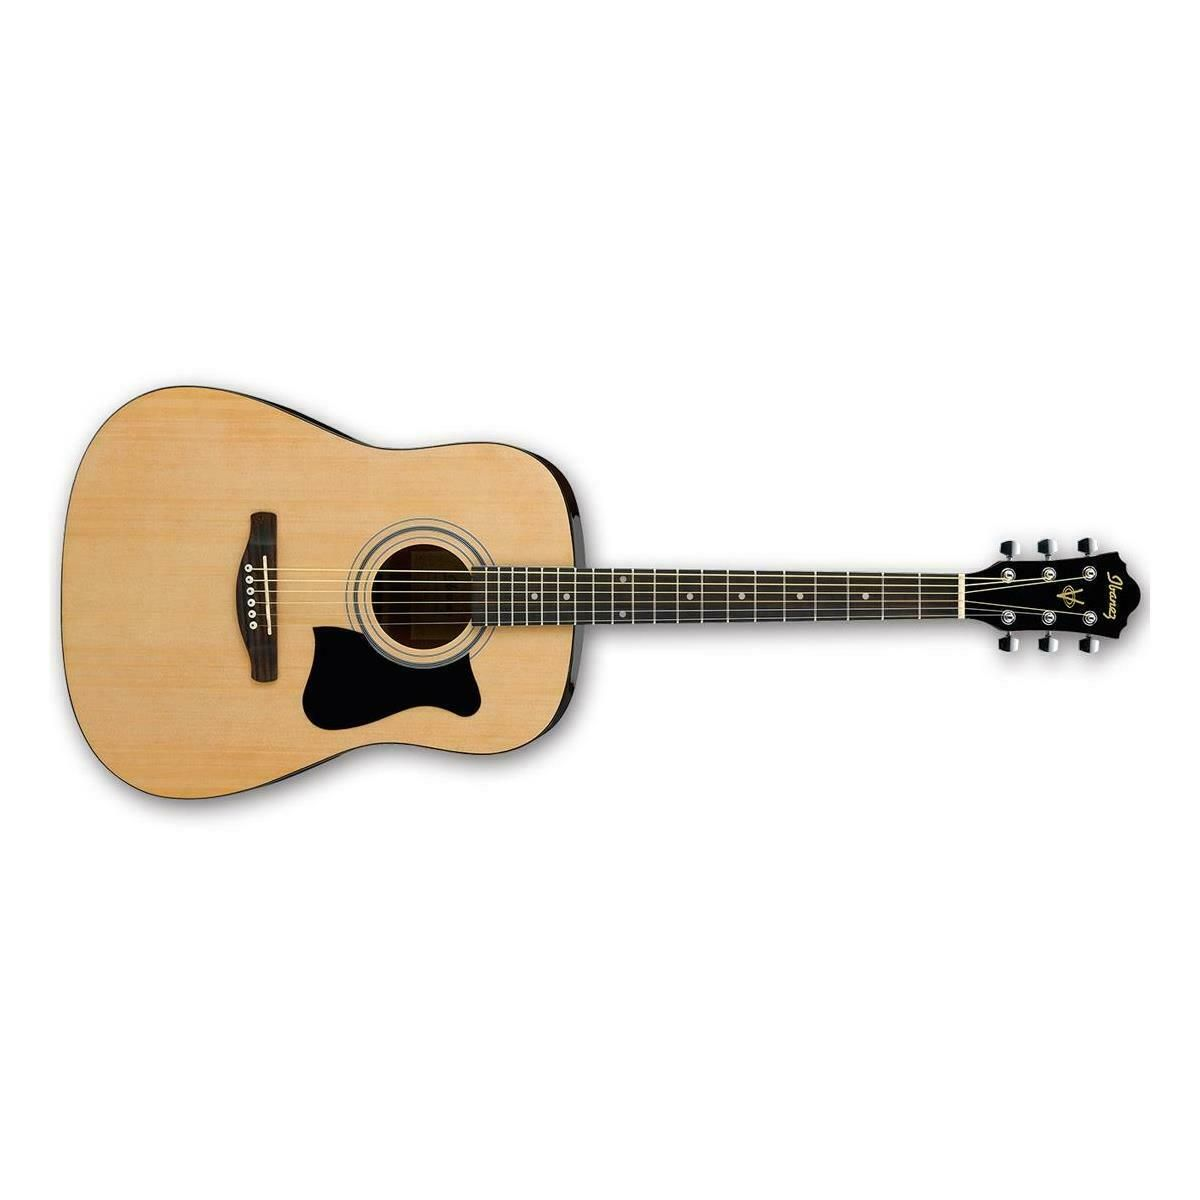 Ibanez Jampack Ijv50 Dreadnought Acoustic Guitar Package 606559300976 Ebay In 2020 Guitar Acoustic Guitar Acoustic